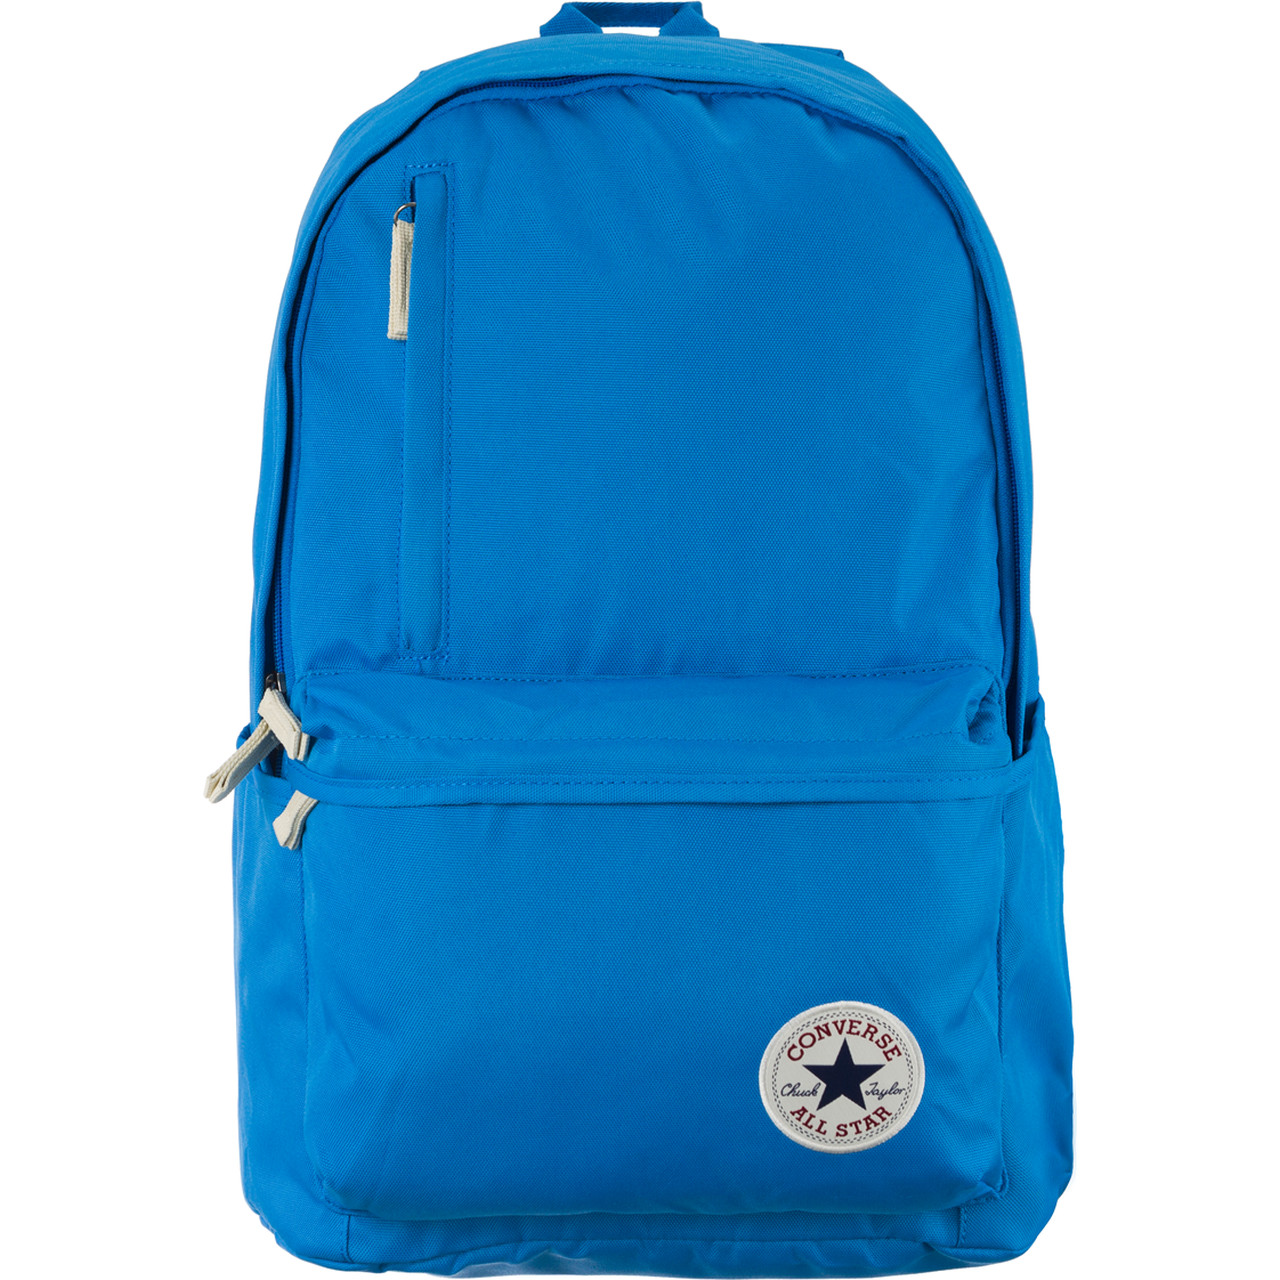 5bb17faf11cd ... best loved 21b28 56194 Plecak Converse Core Original Backpack  434(13632C-434) ...